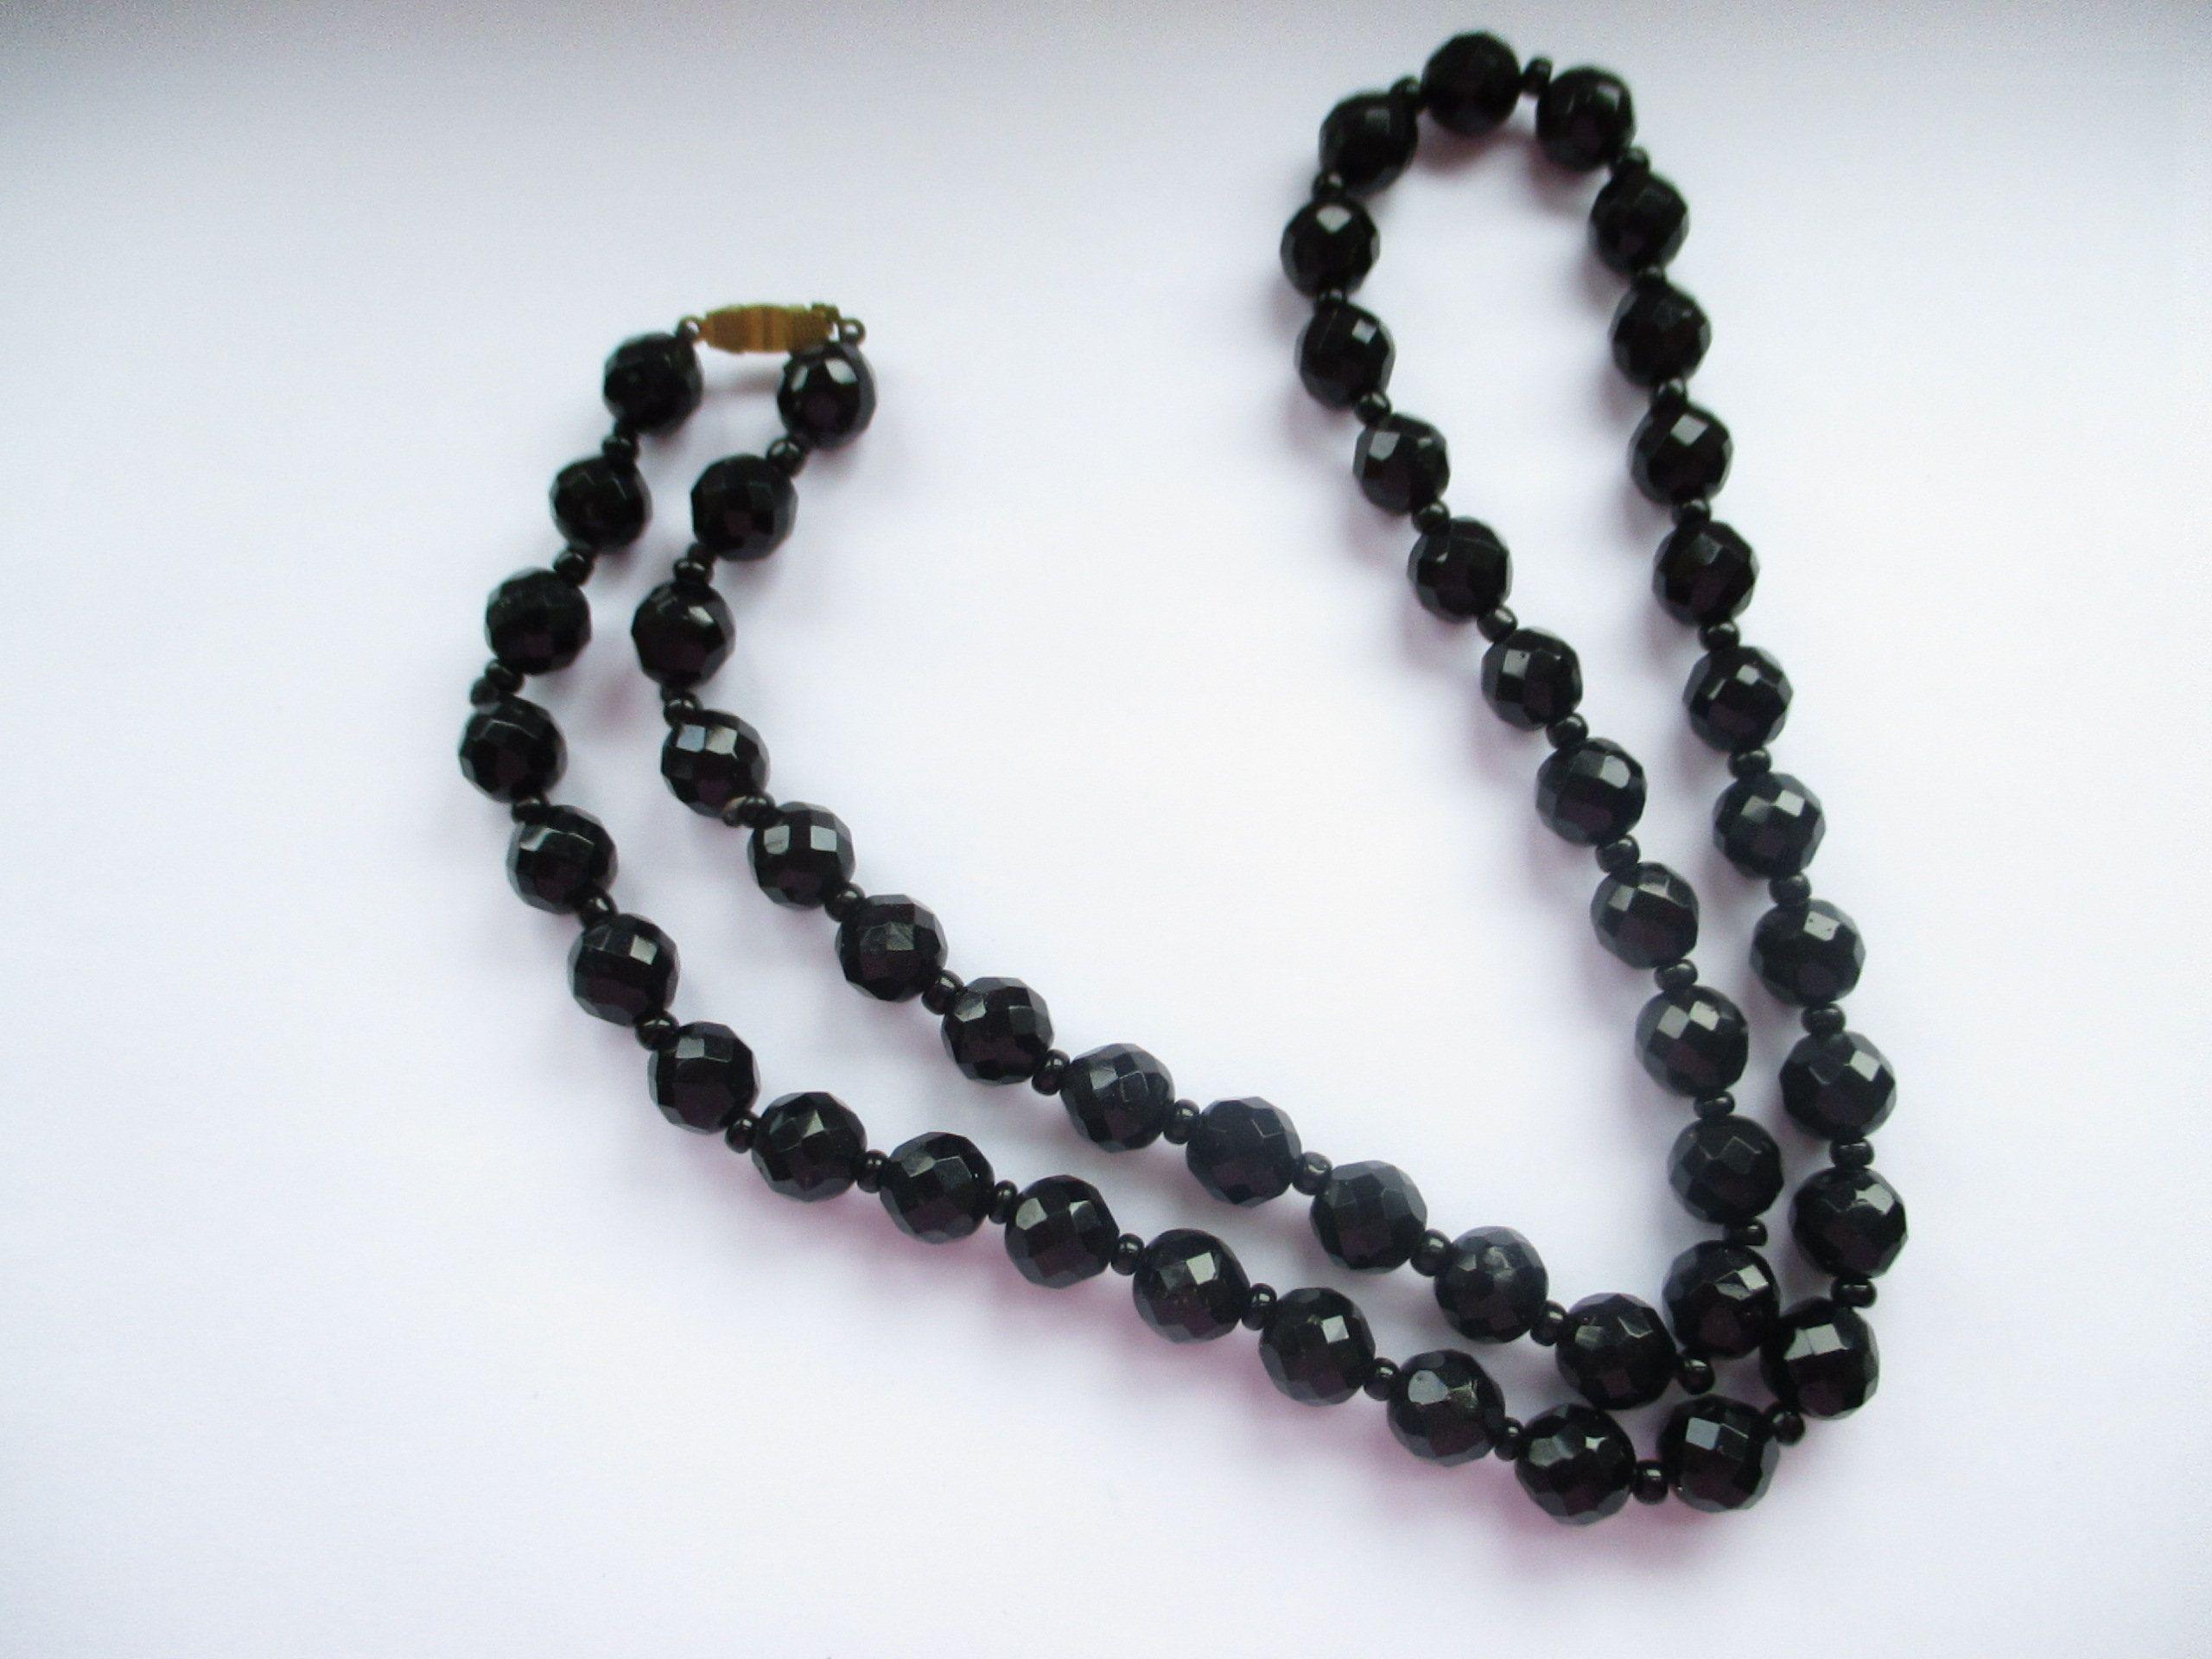 Jet Black Heart Shape Beads 10 mm Vintage